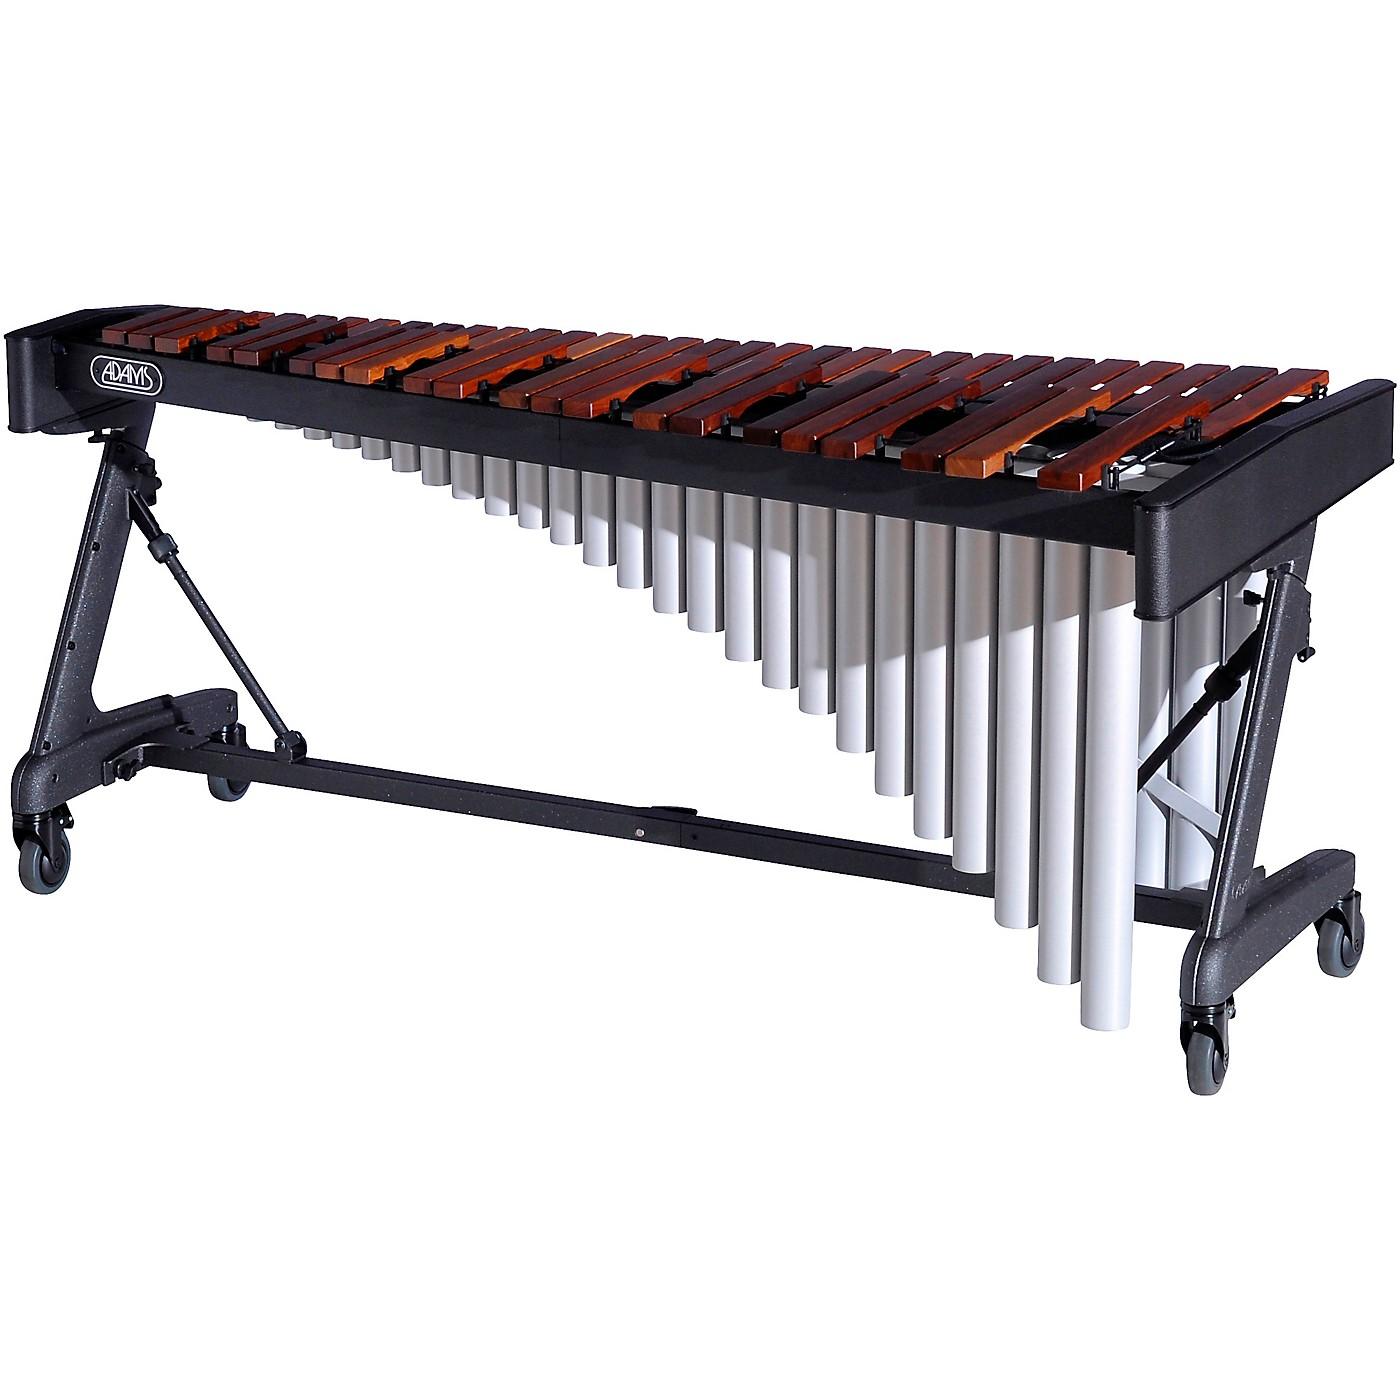 Adams 4.3 Octave Soloist Series Rosewood Bar Marimba with Apex Frame thumbnail